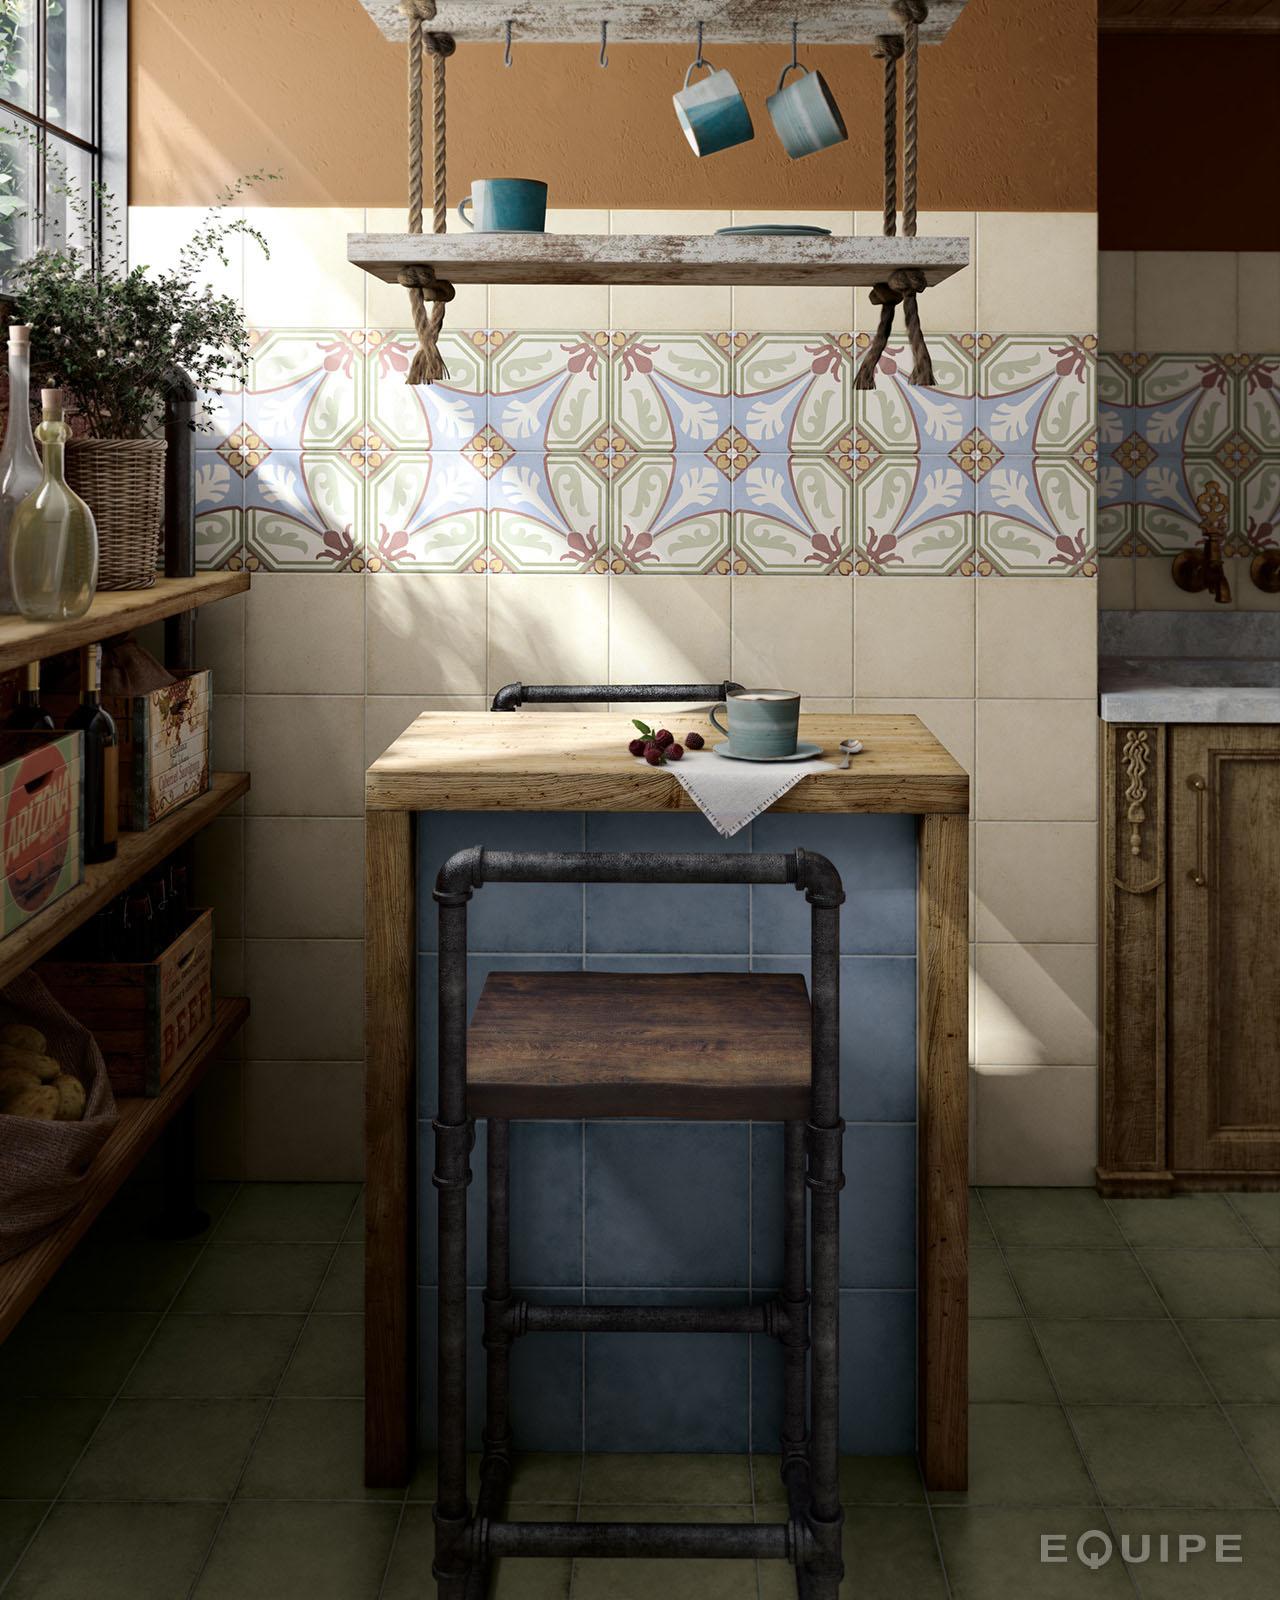 ArtNouveau_CypressGreen_SkyBlue_Biscuit_VienaColor_Kitchen.jpg